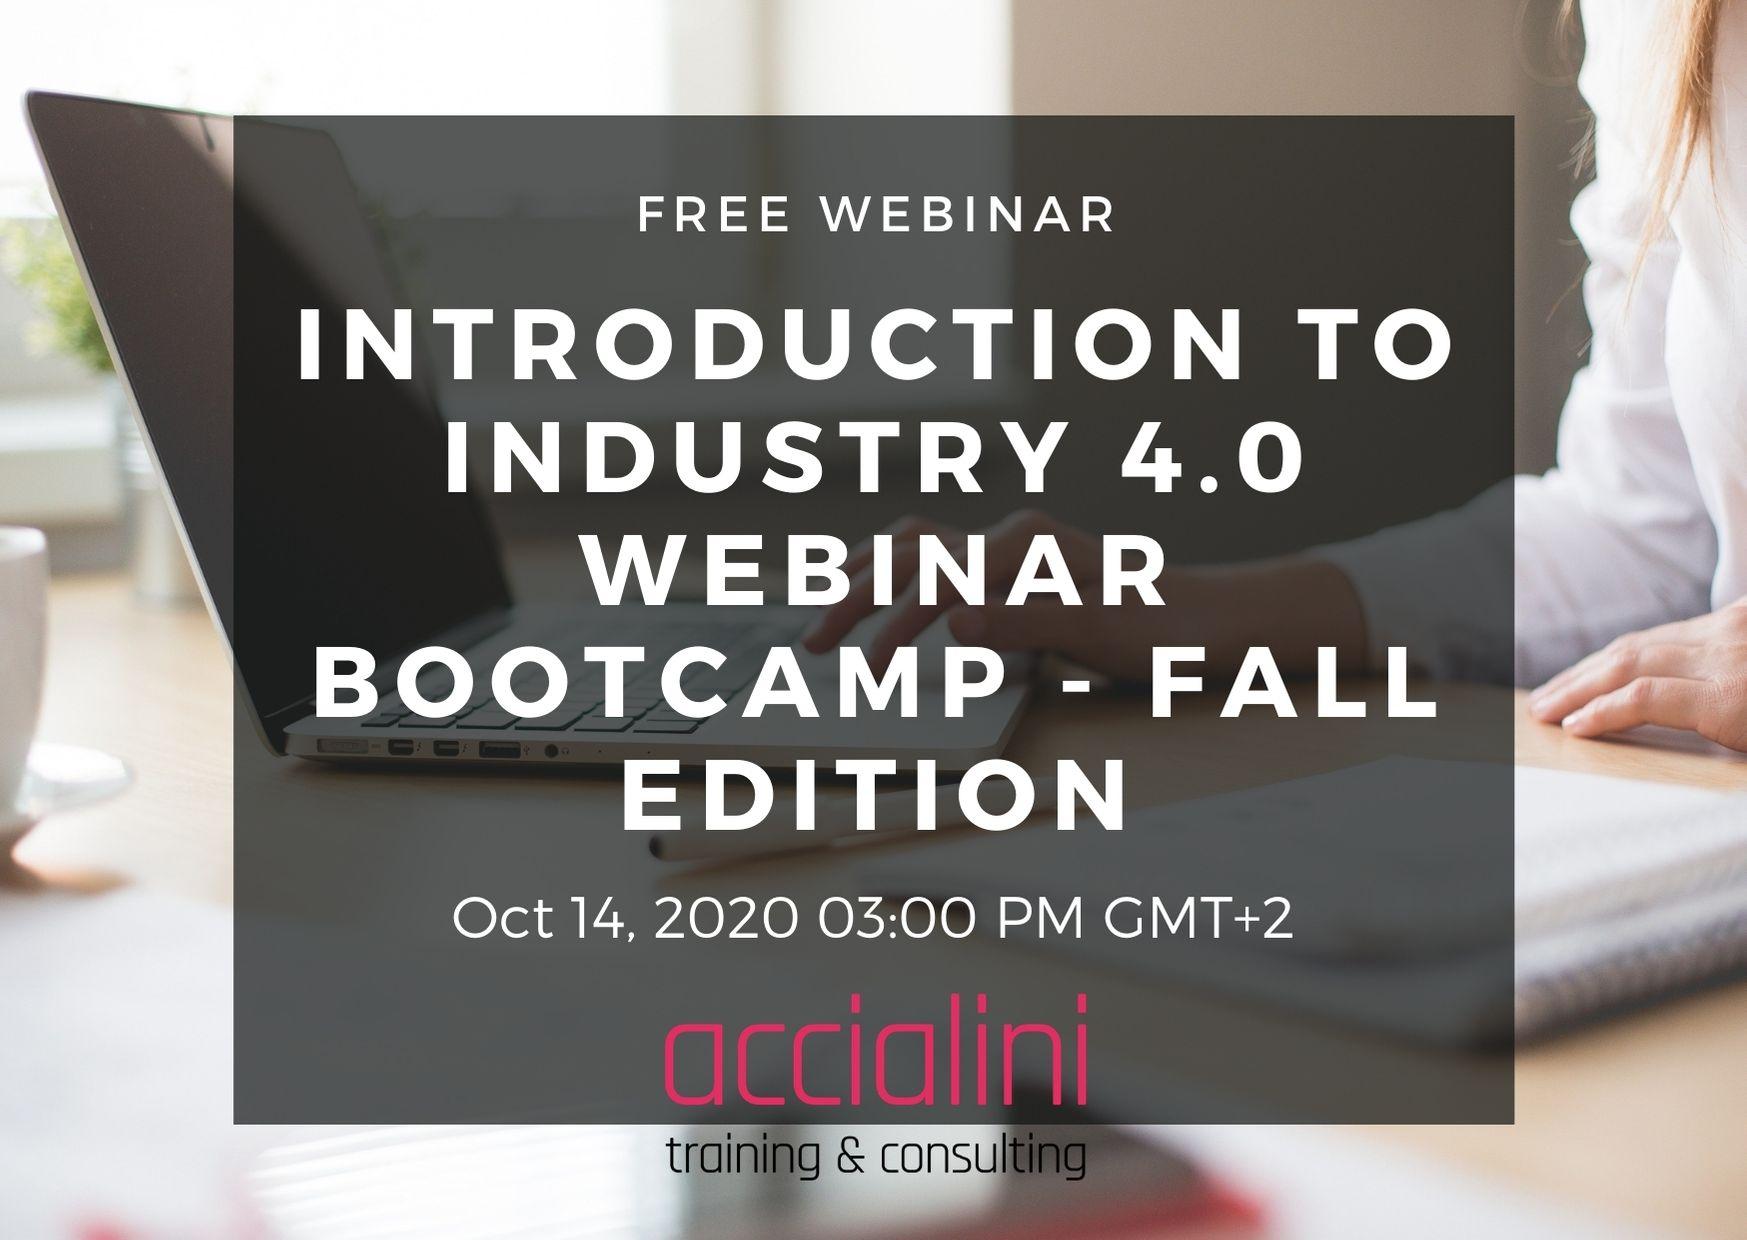 webinar industry 4.0 bootcamp fall edition 2020